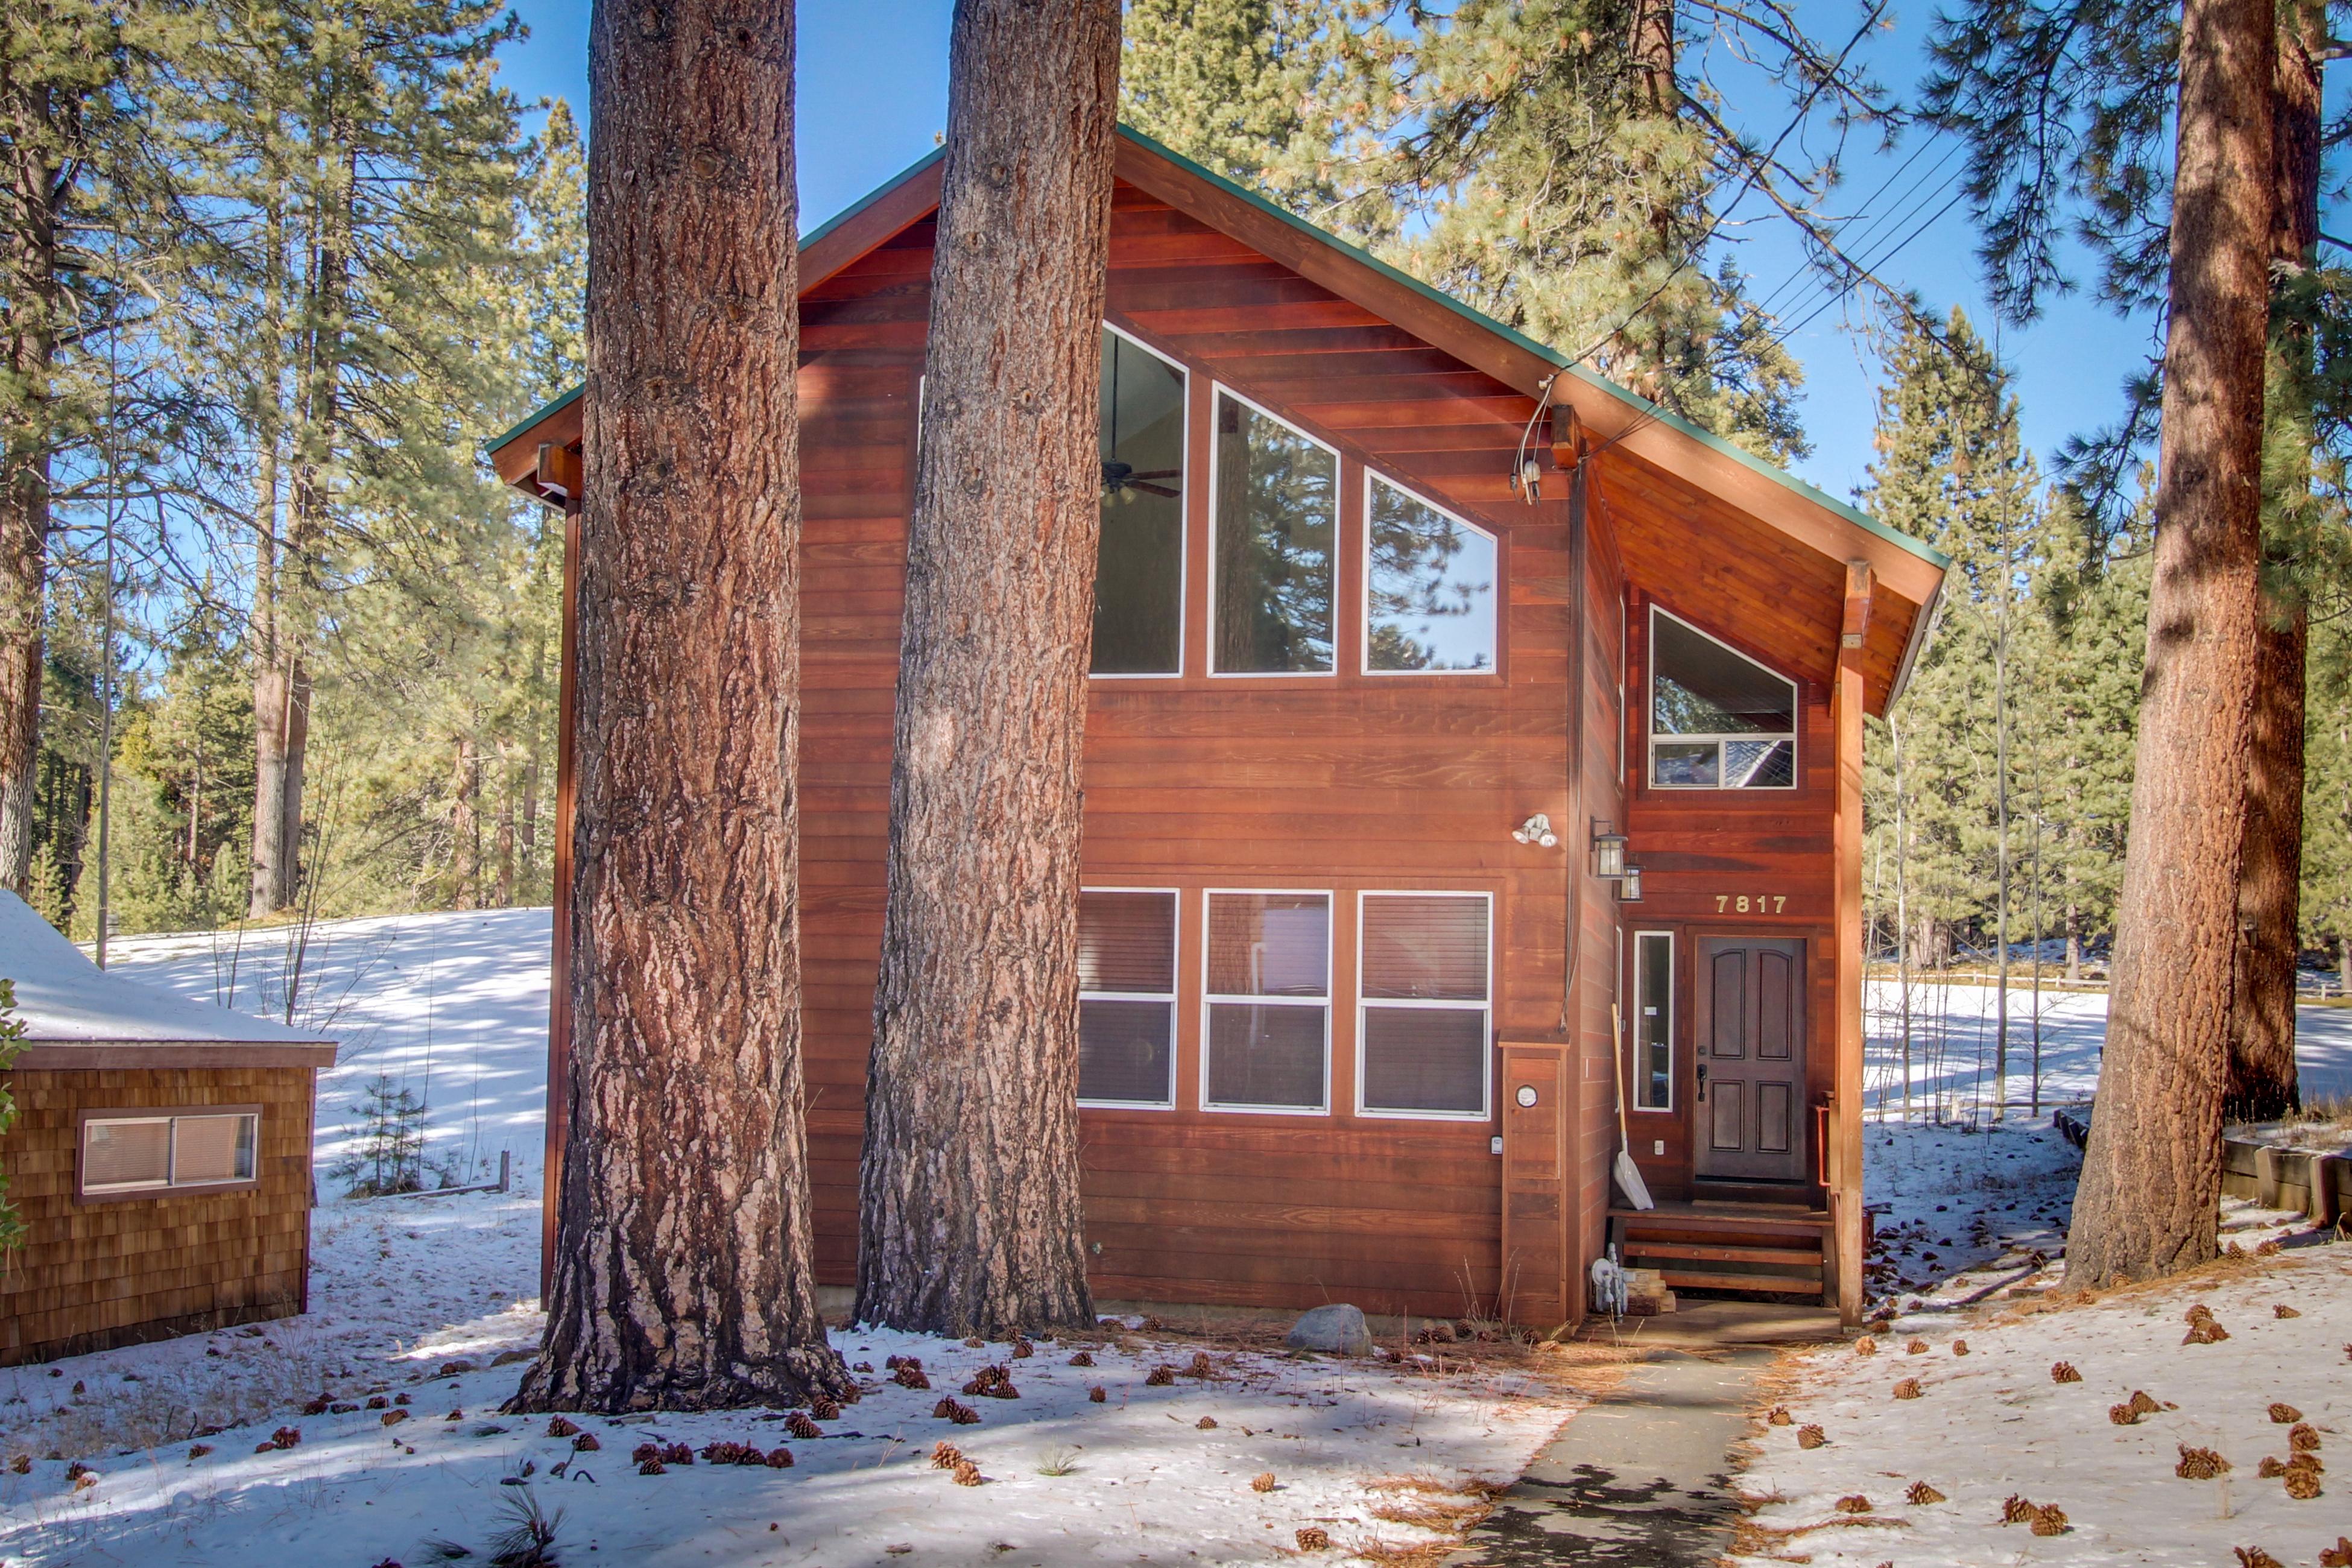 cabin living for once tahoe hot cabins deck tub summer lake enjoyment story rent den rentals heavenly large vacation bear